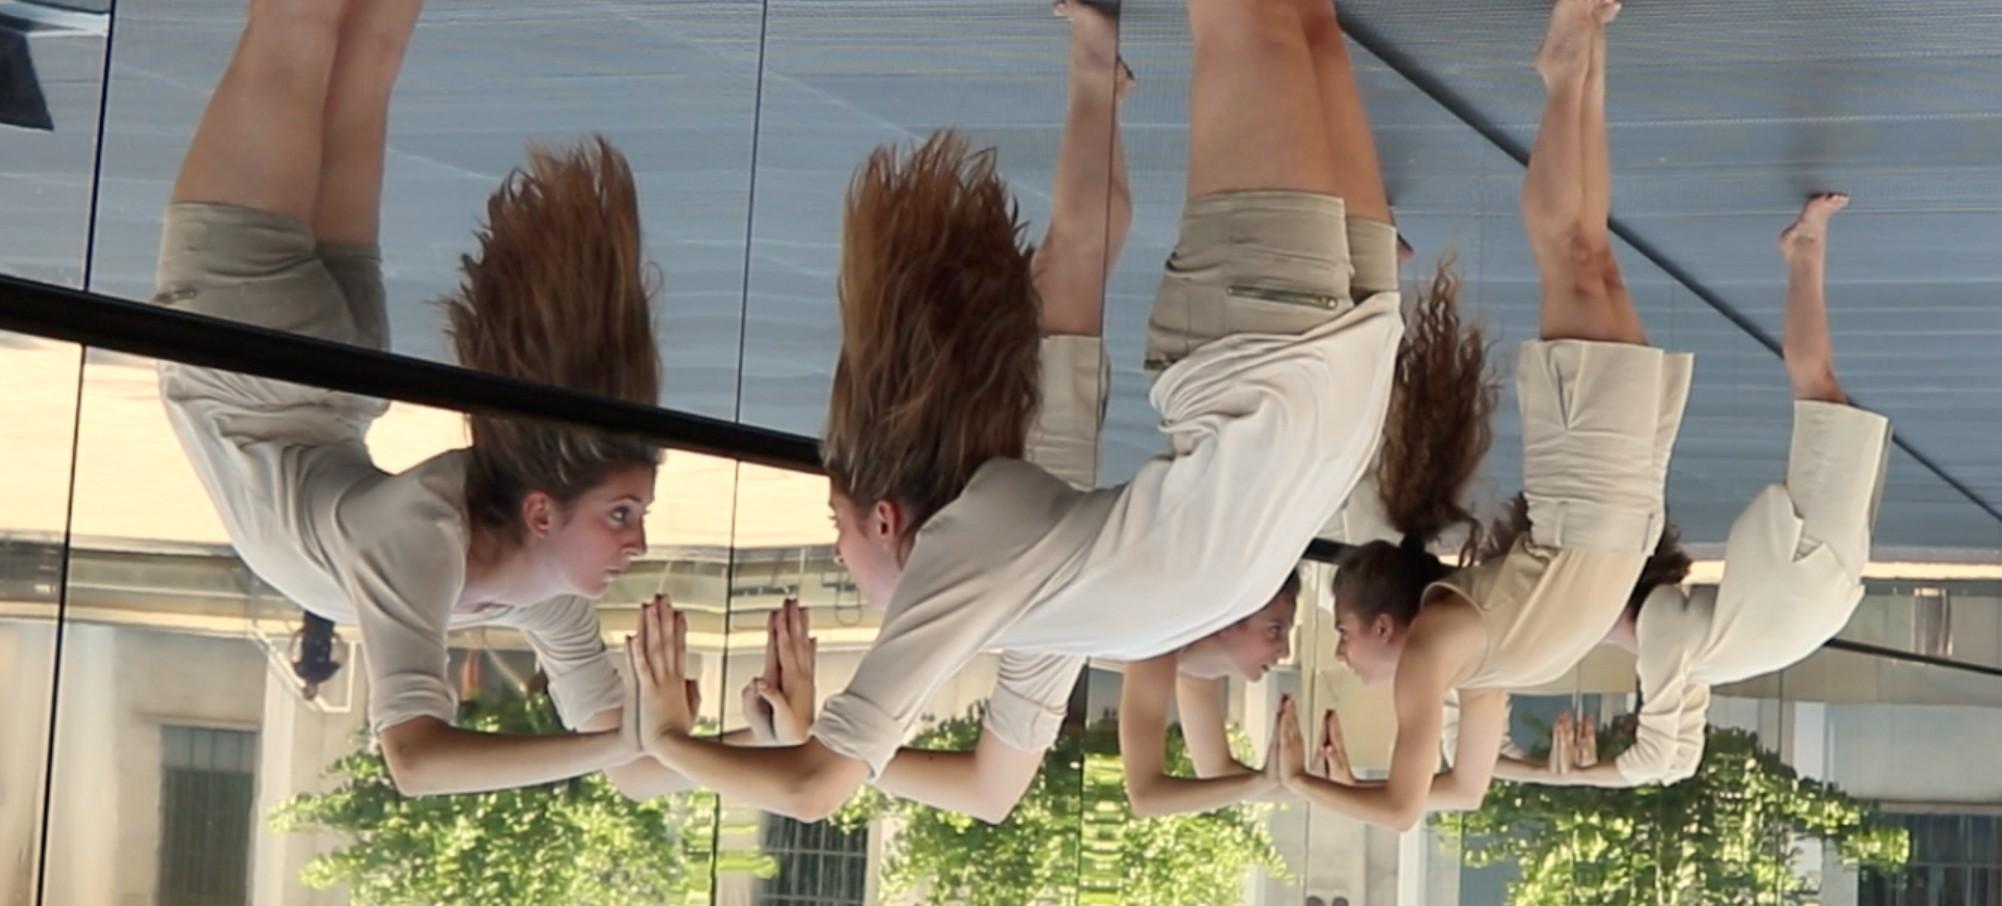 """Attraverso i Muri di Bruma"", com Erica Meucci, Cecilia Tragni e Loredana Tarnovschi (Foto: Billy Cowie)"